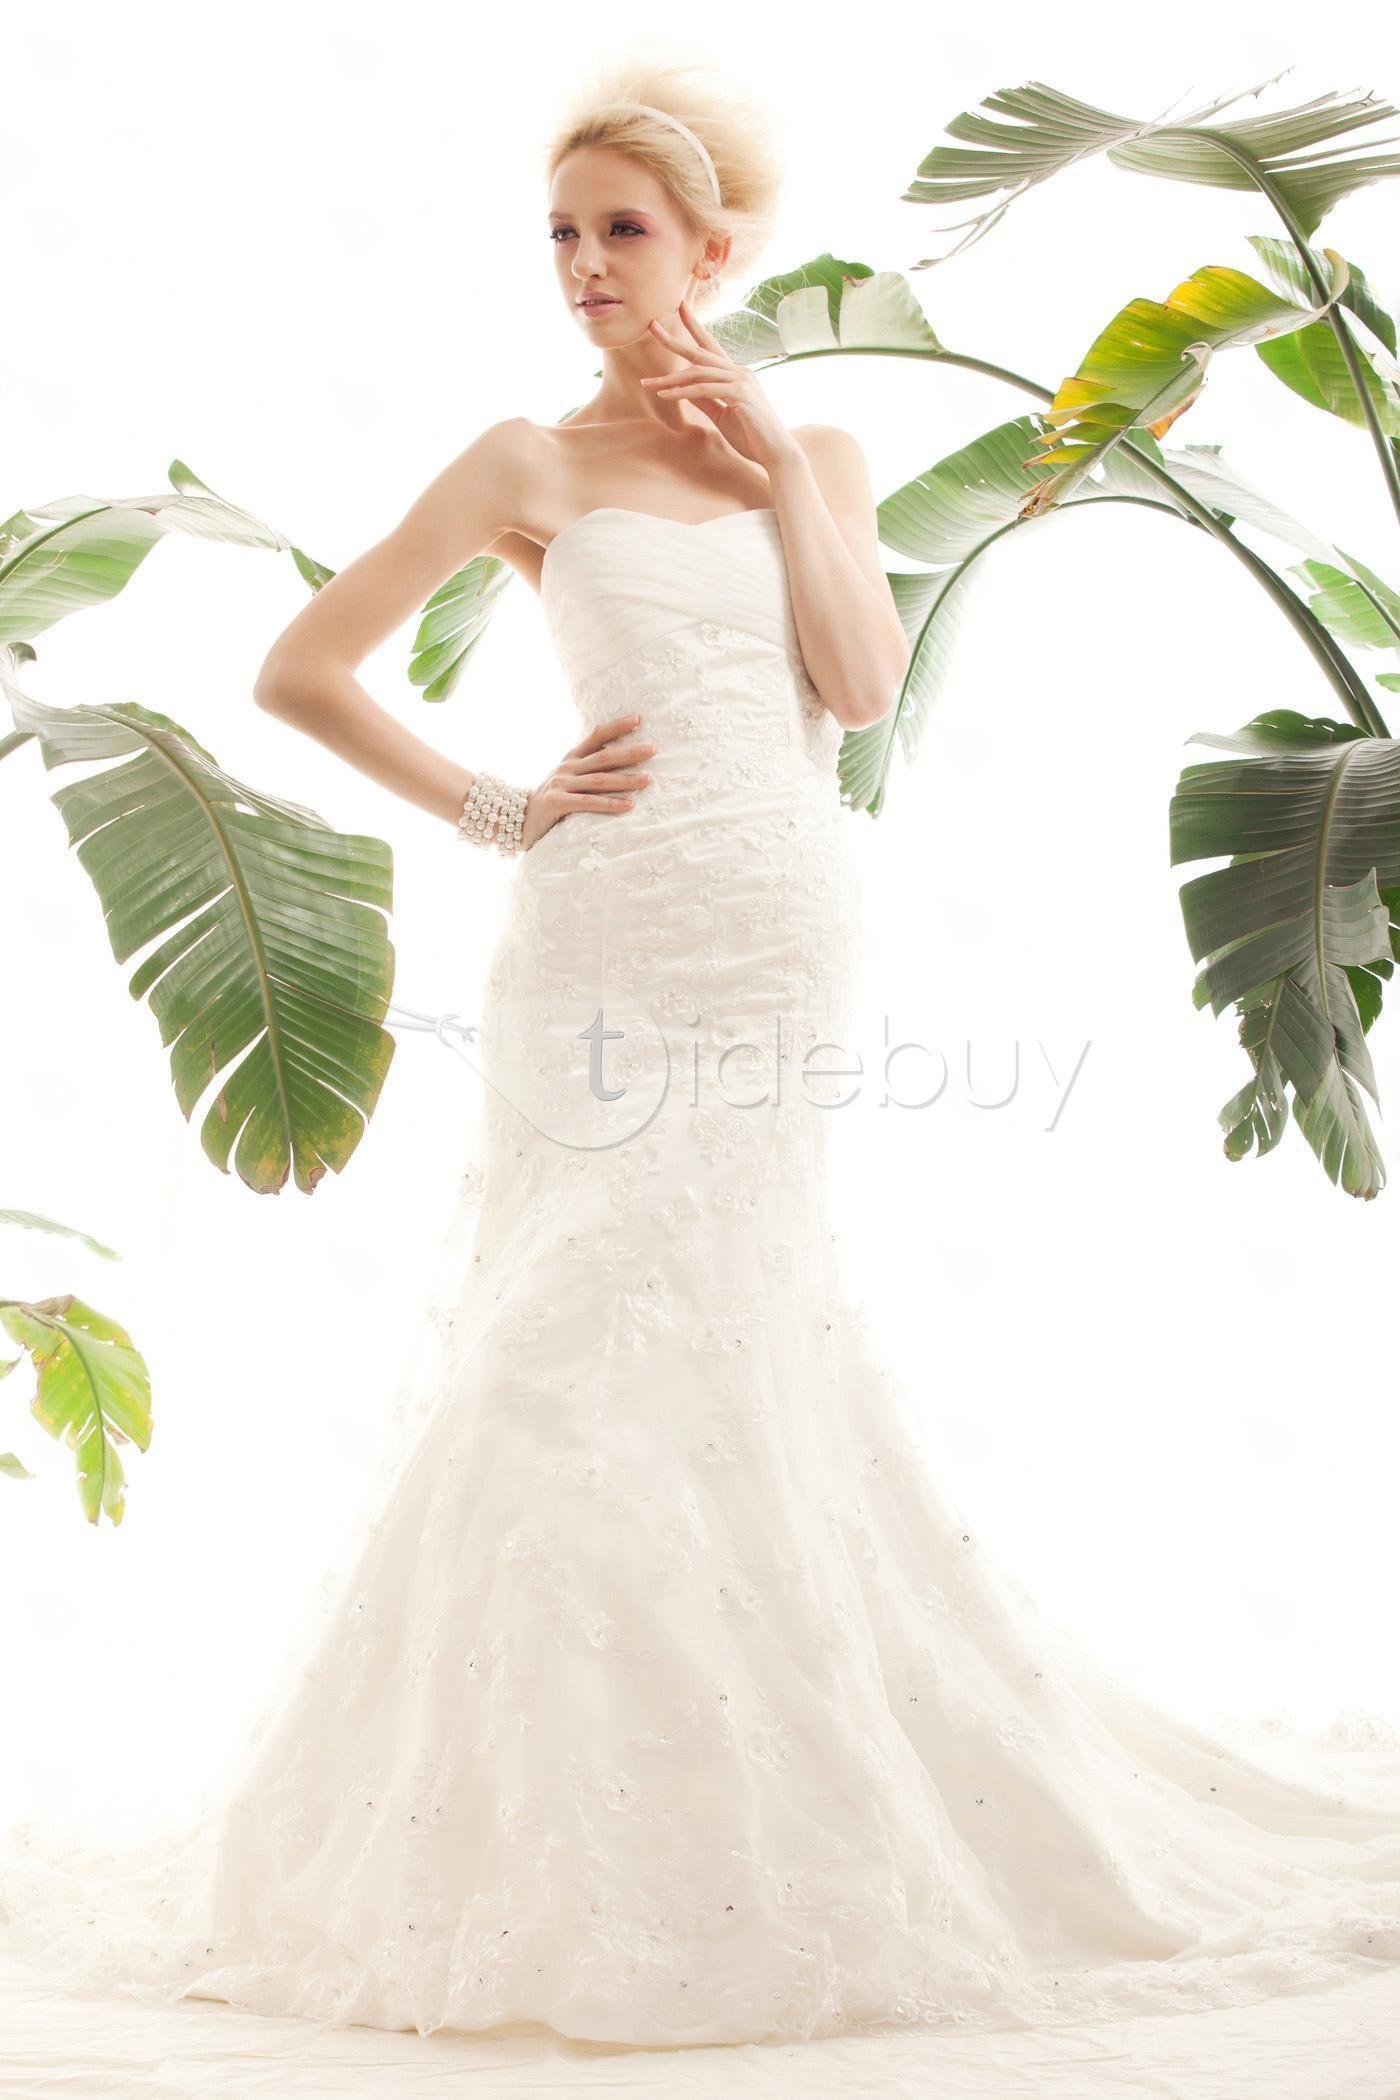 Elegant Trumpet/Mermaid Sweetheart Court Train Lace Nastye's Bridal Wedding Dress